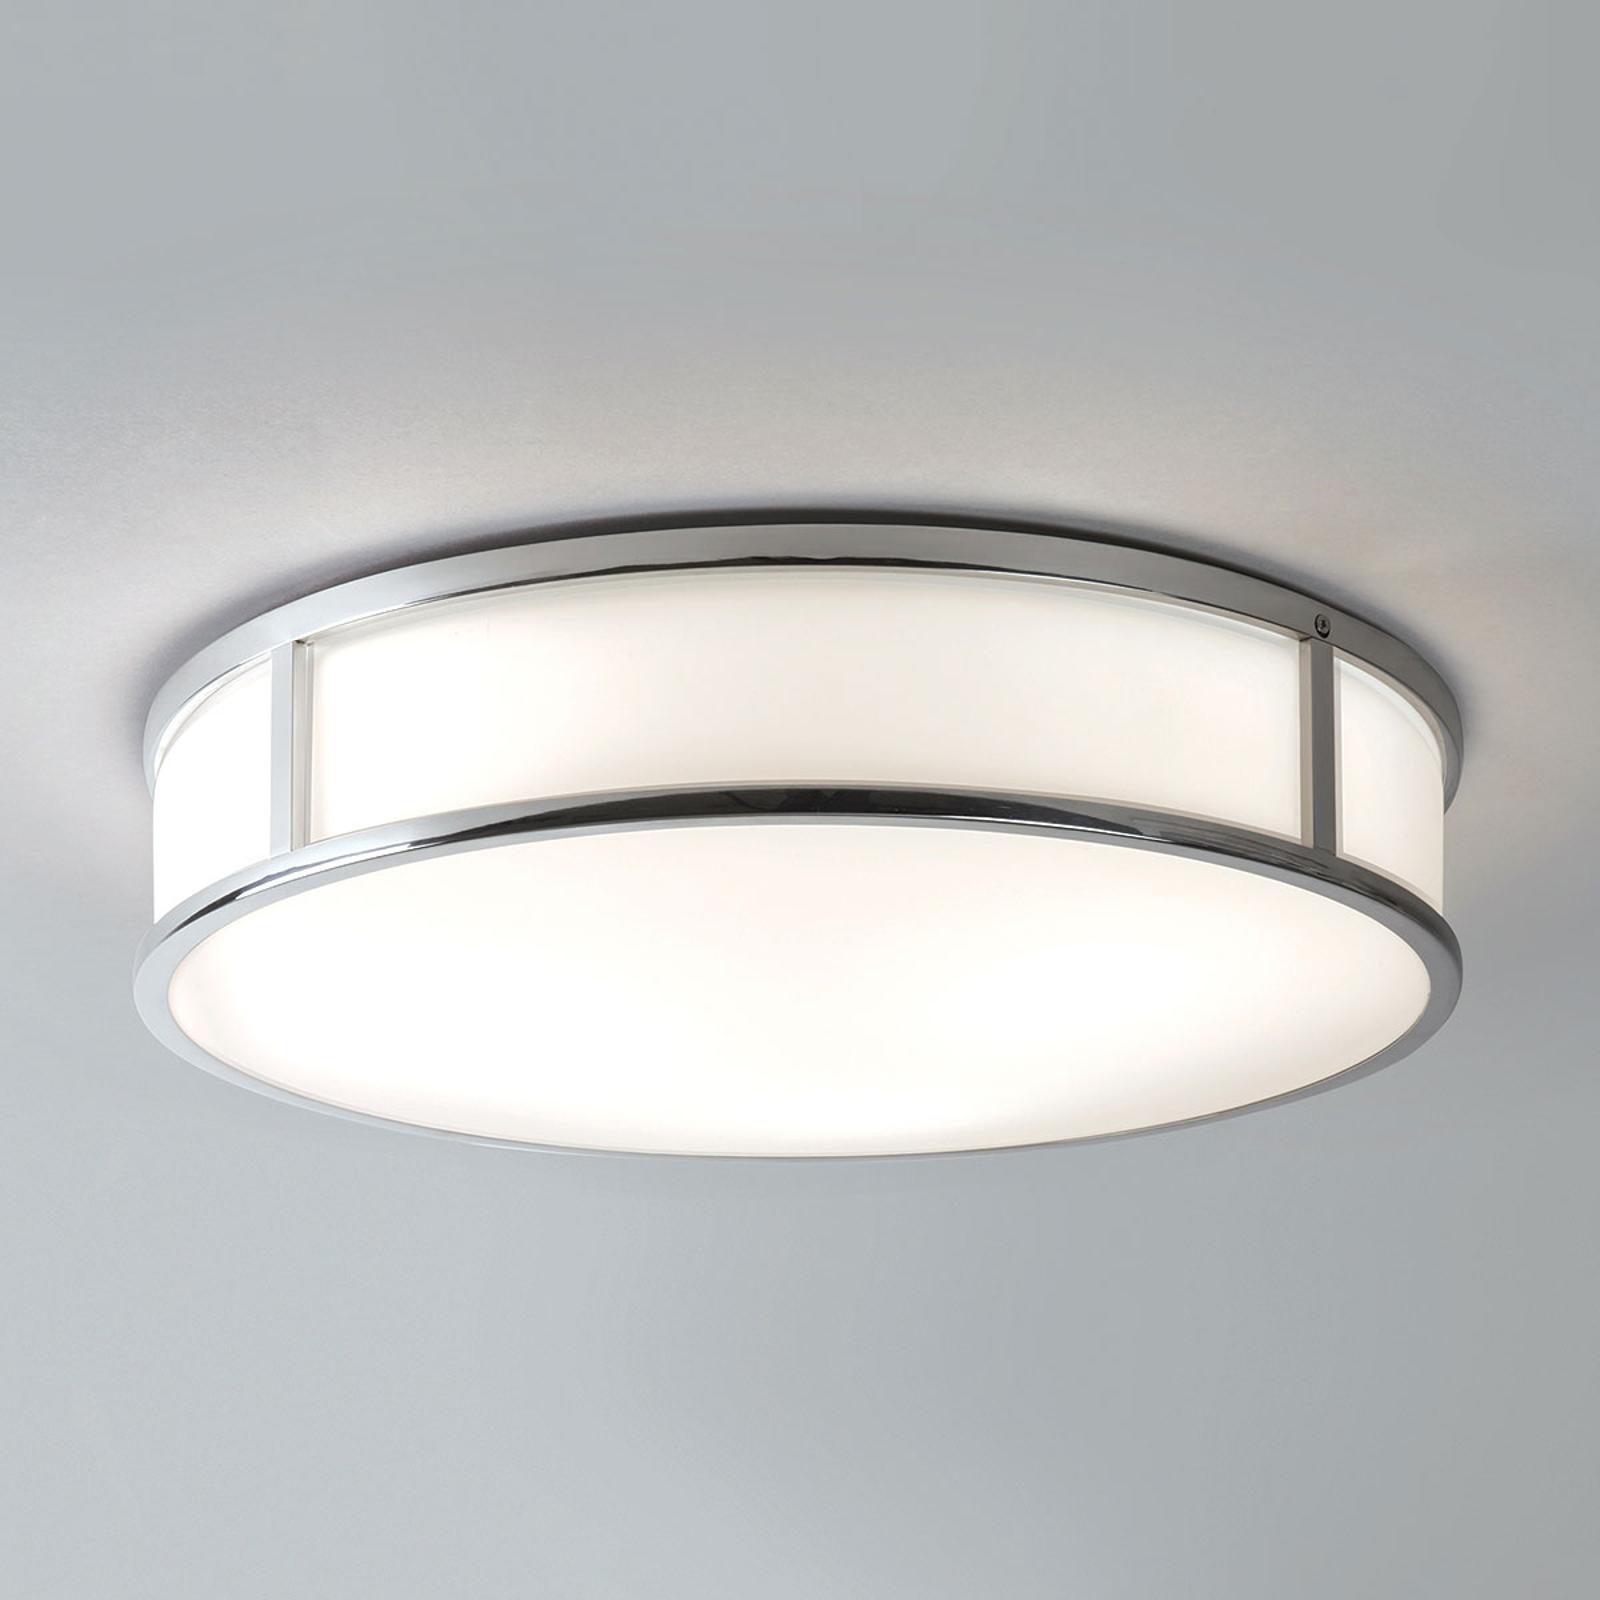 Astro Mashiko Round lámpara de techo Ø 40 cm cromo